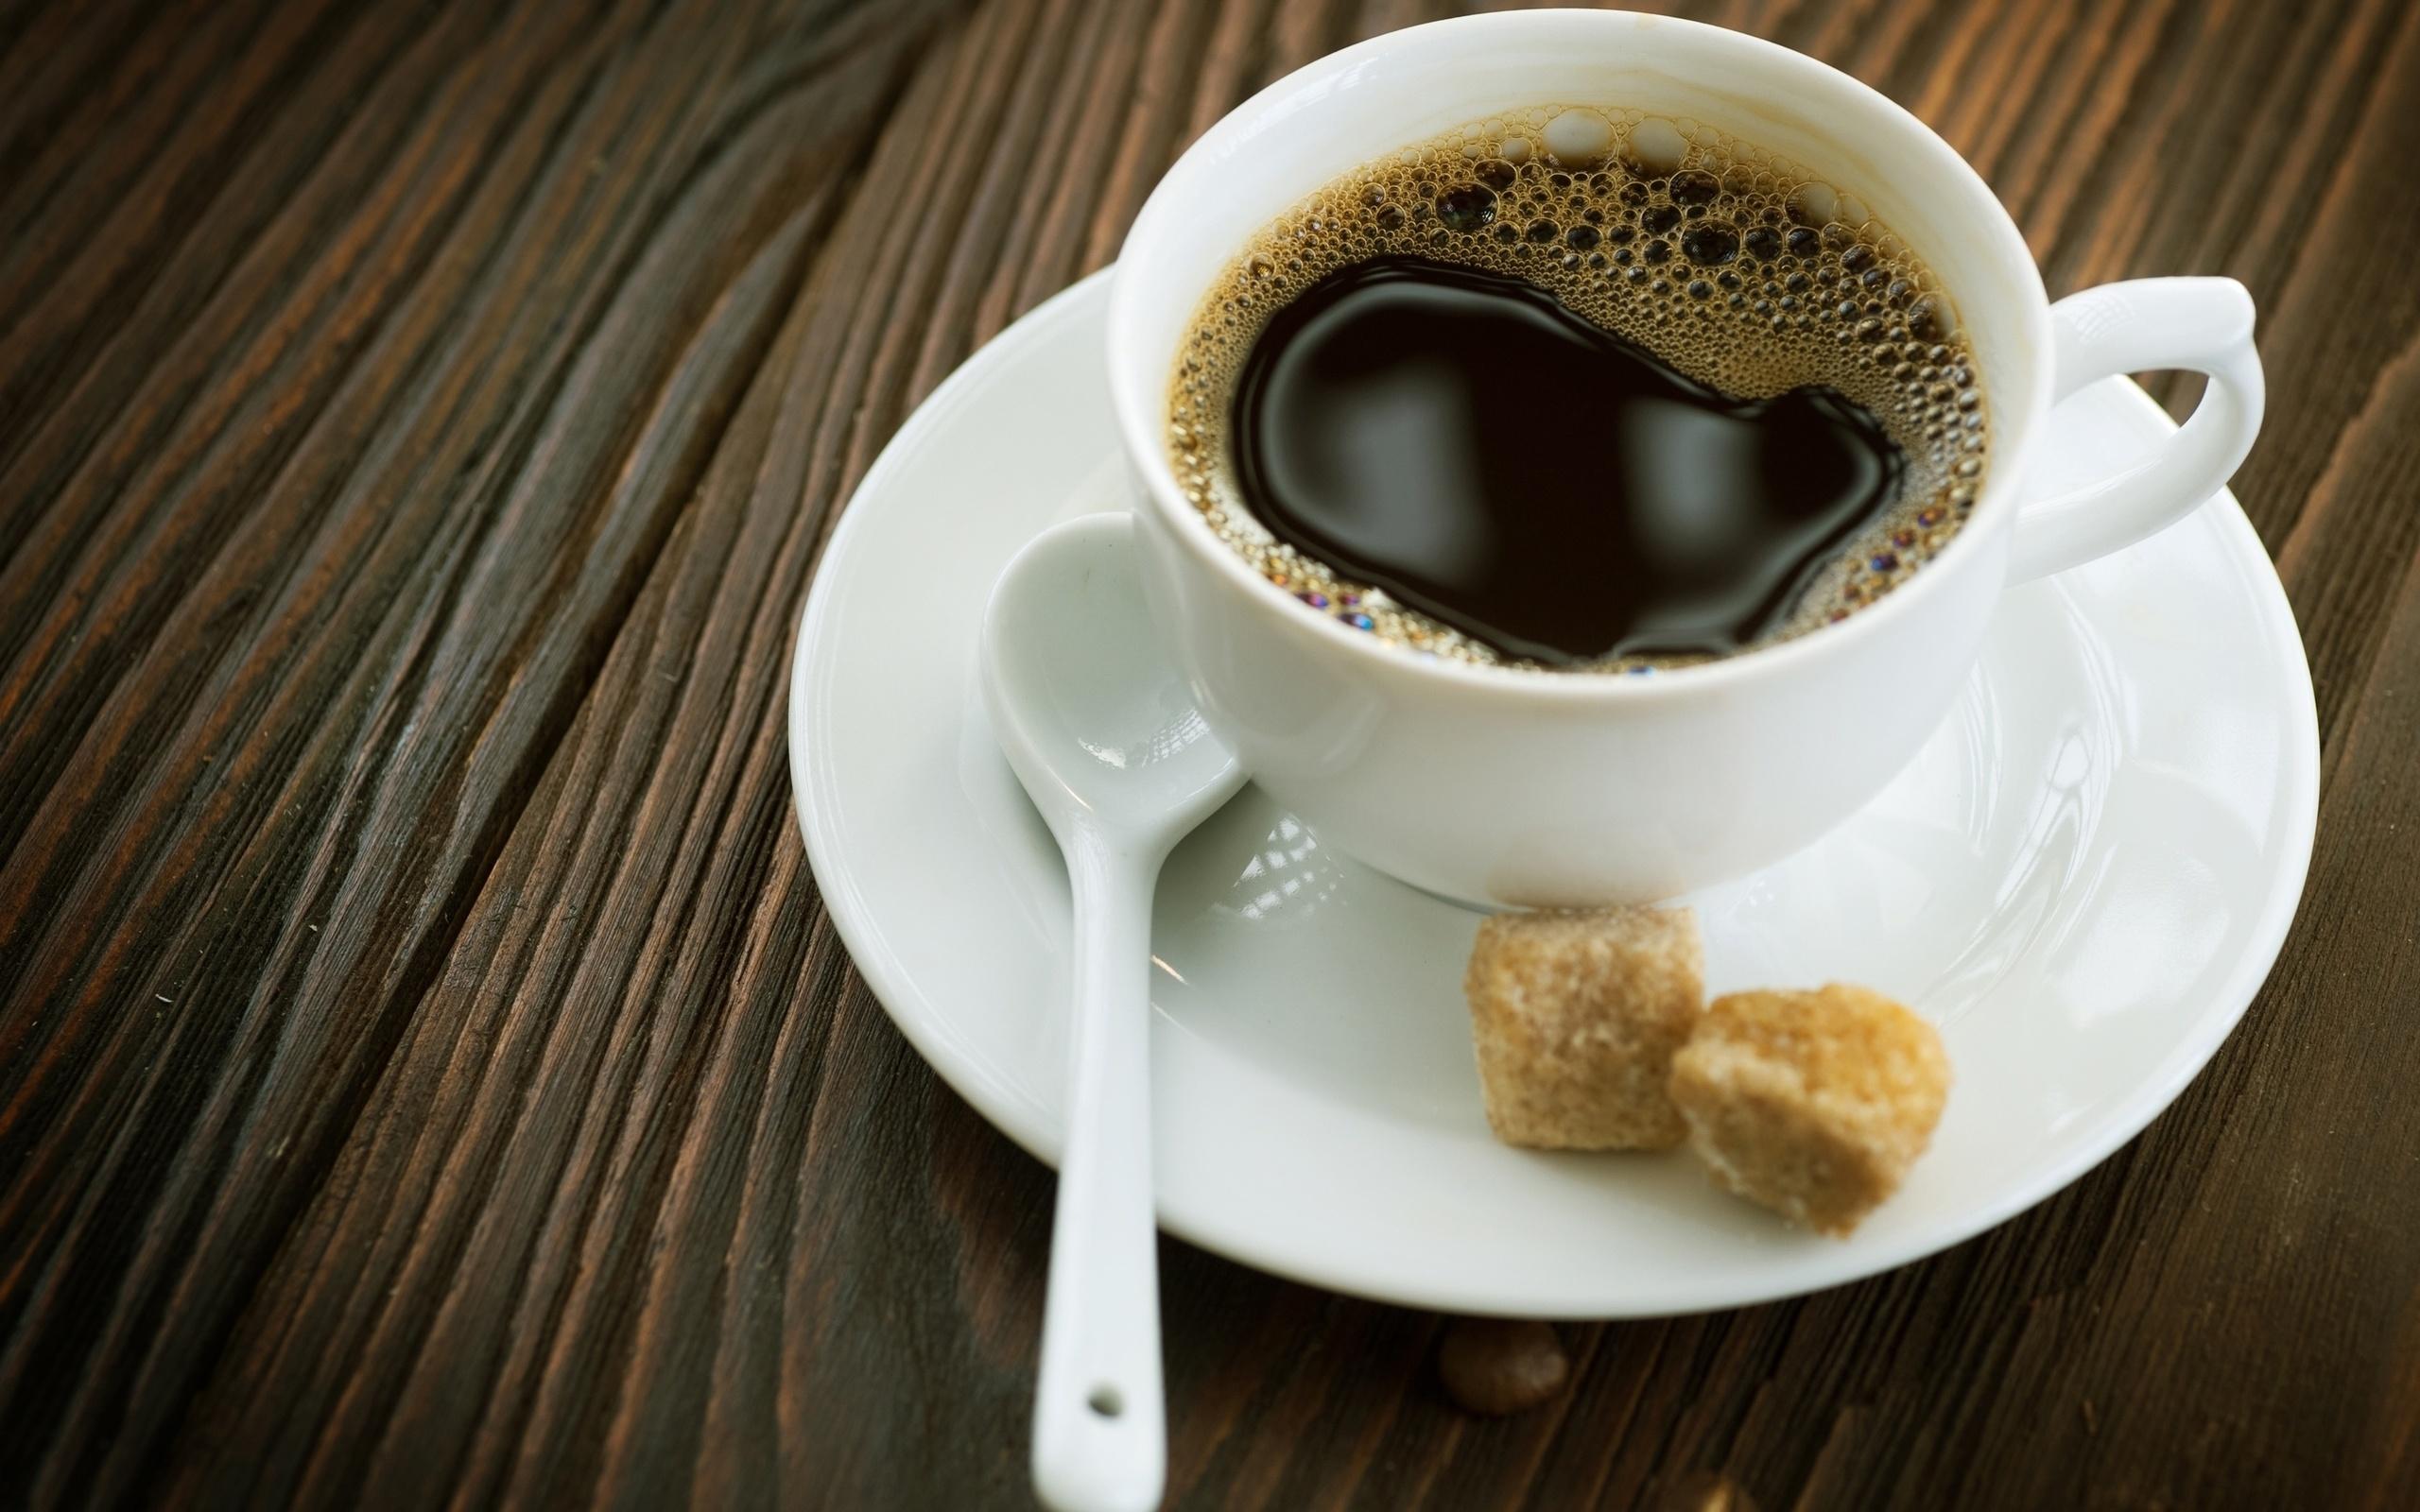 Тете картинки, кофе картинки красивые фото с надписями